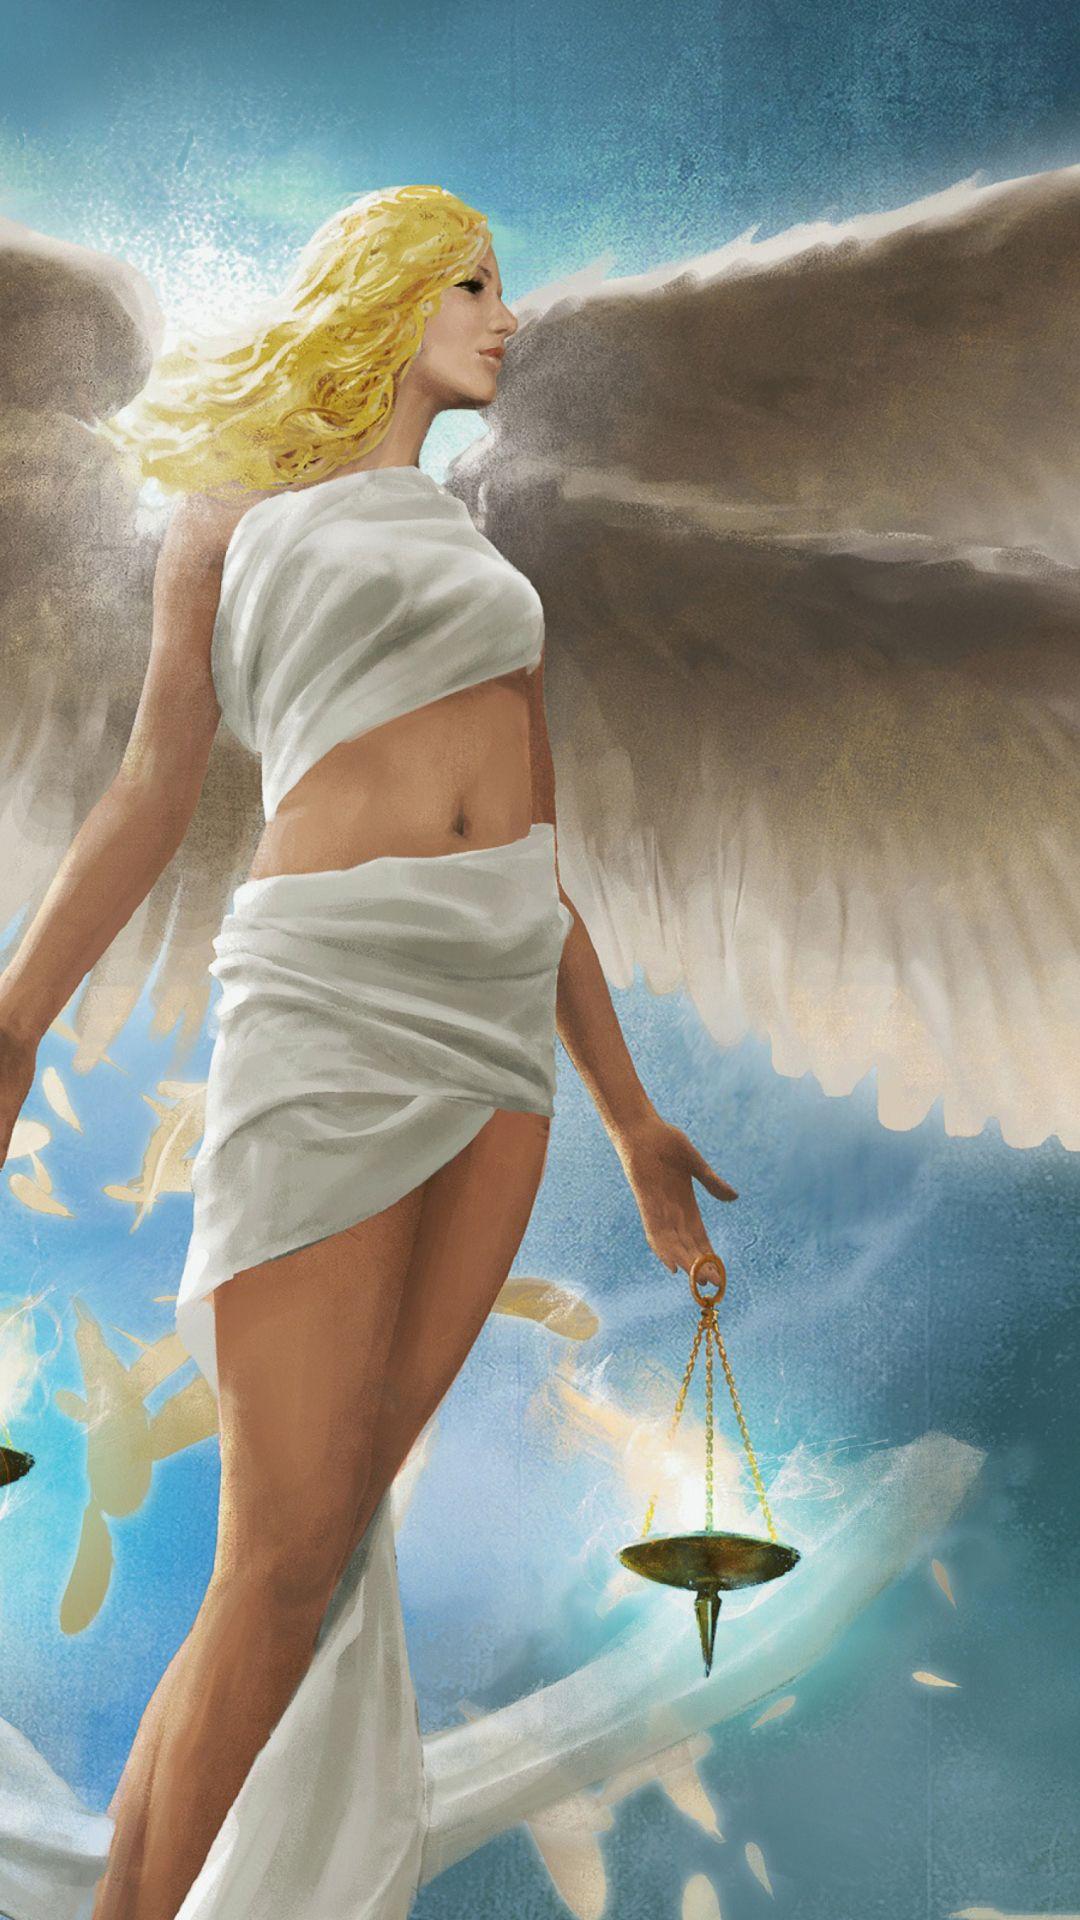 Photo Of Angel Wings Girl